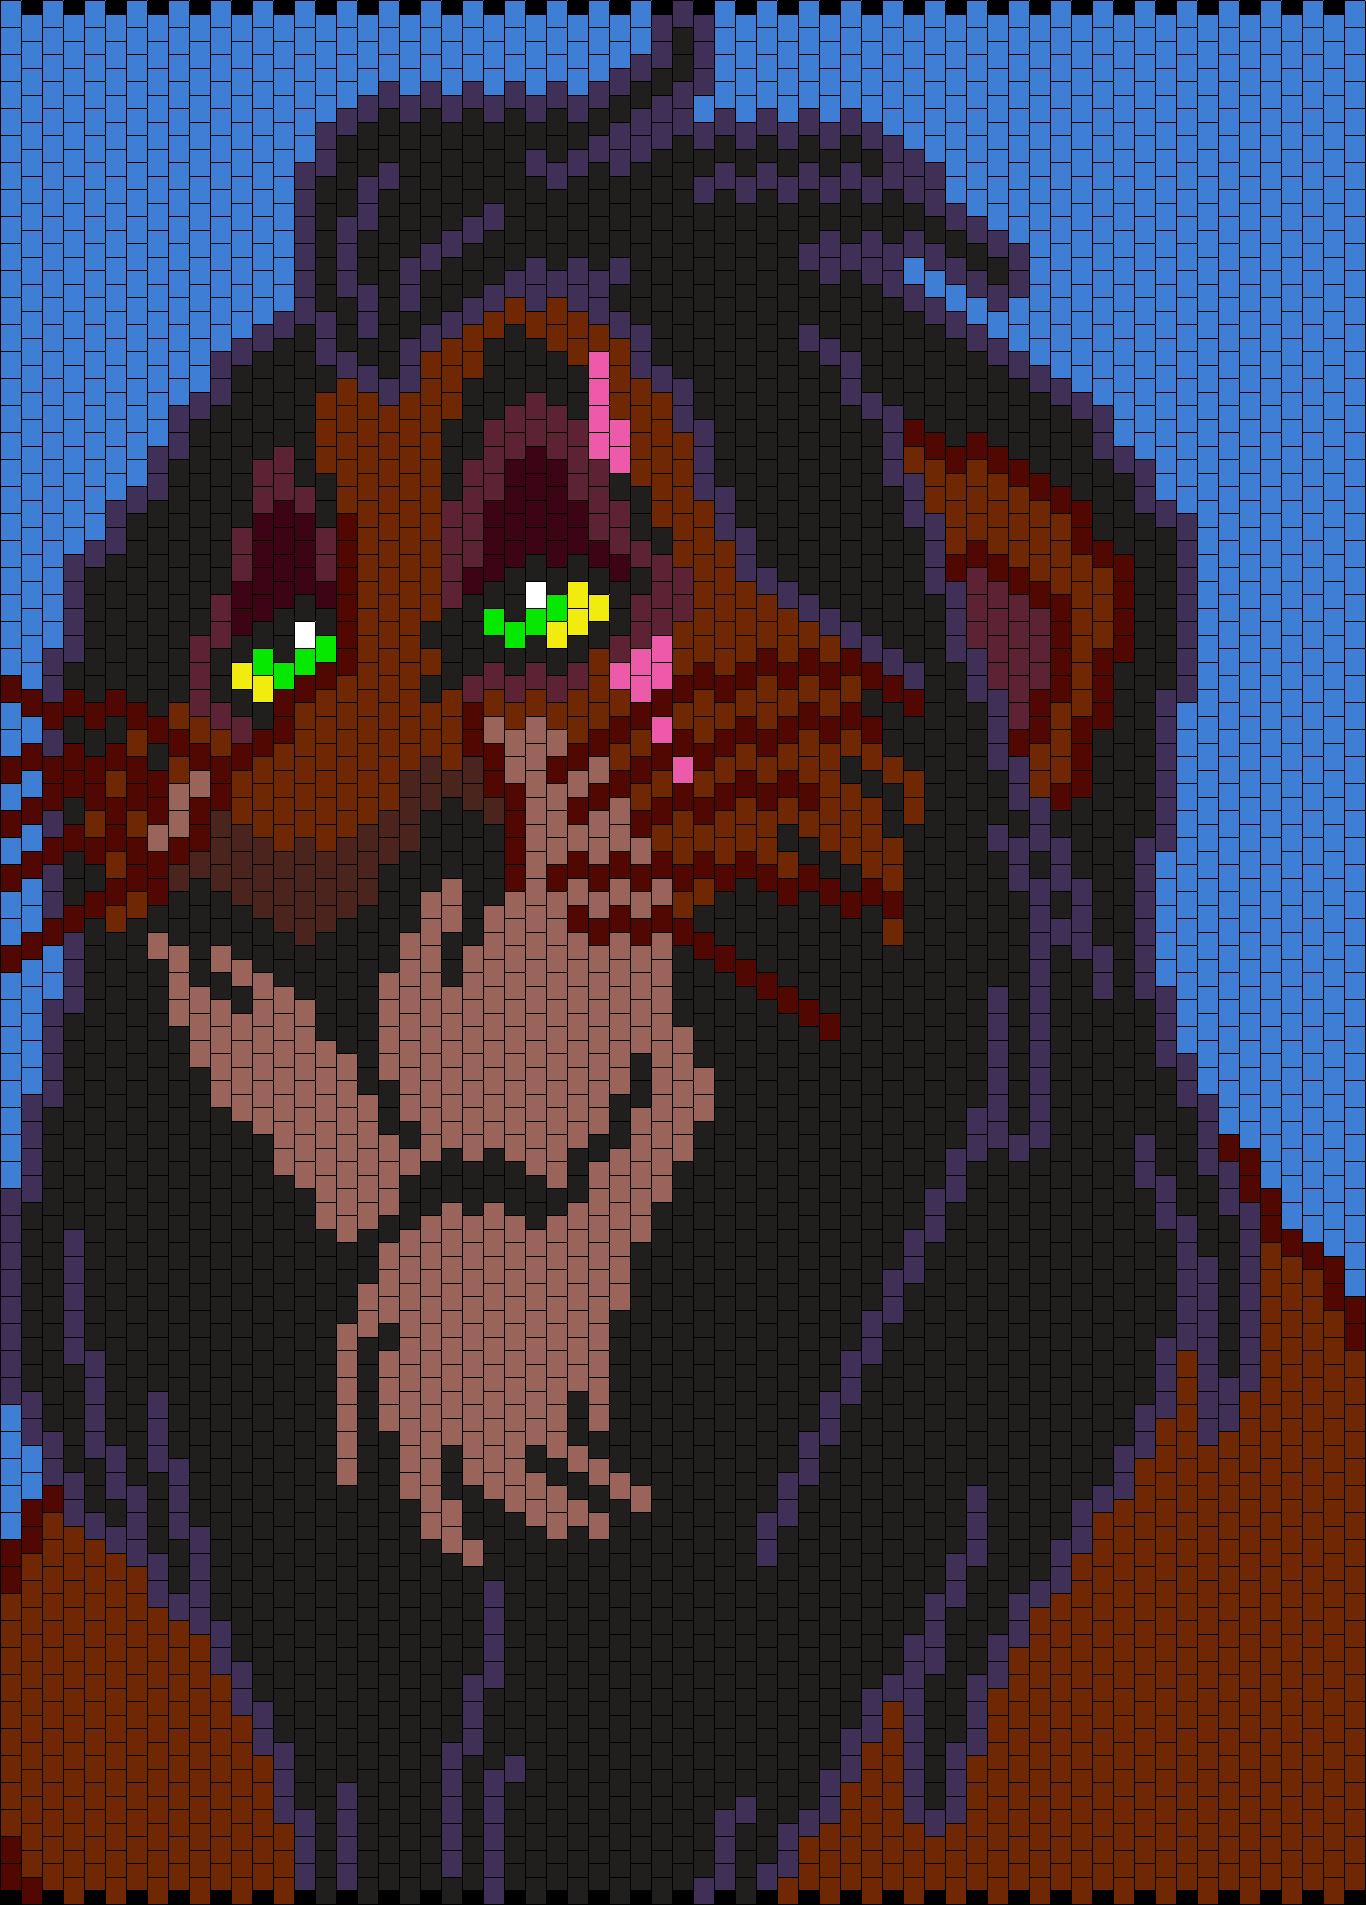 Scar From Lion King (Multi) Bead Pattern   Bead patterns   Pinterest ...